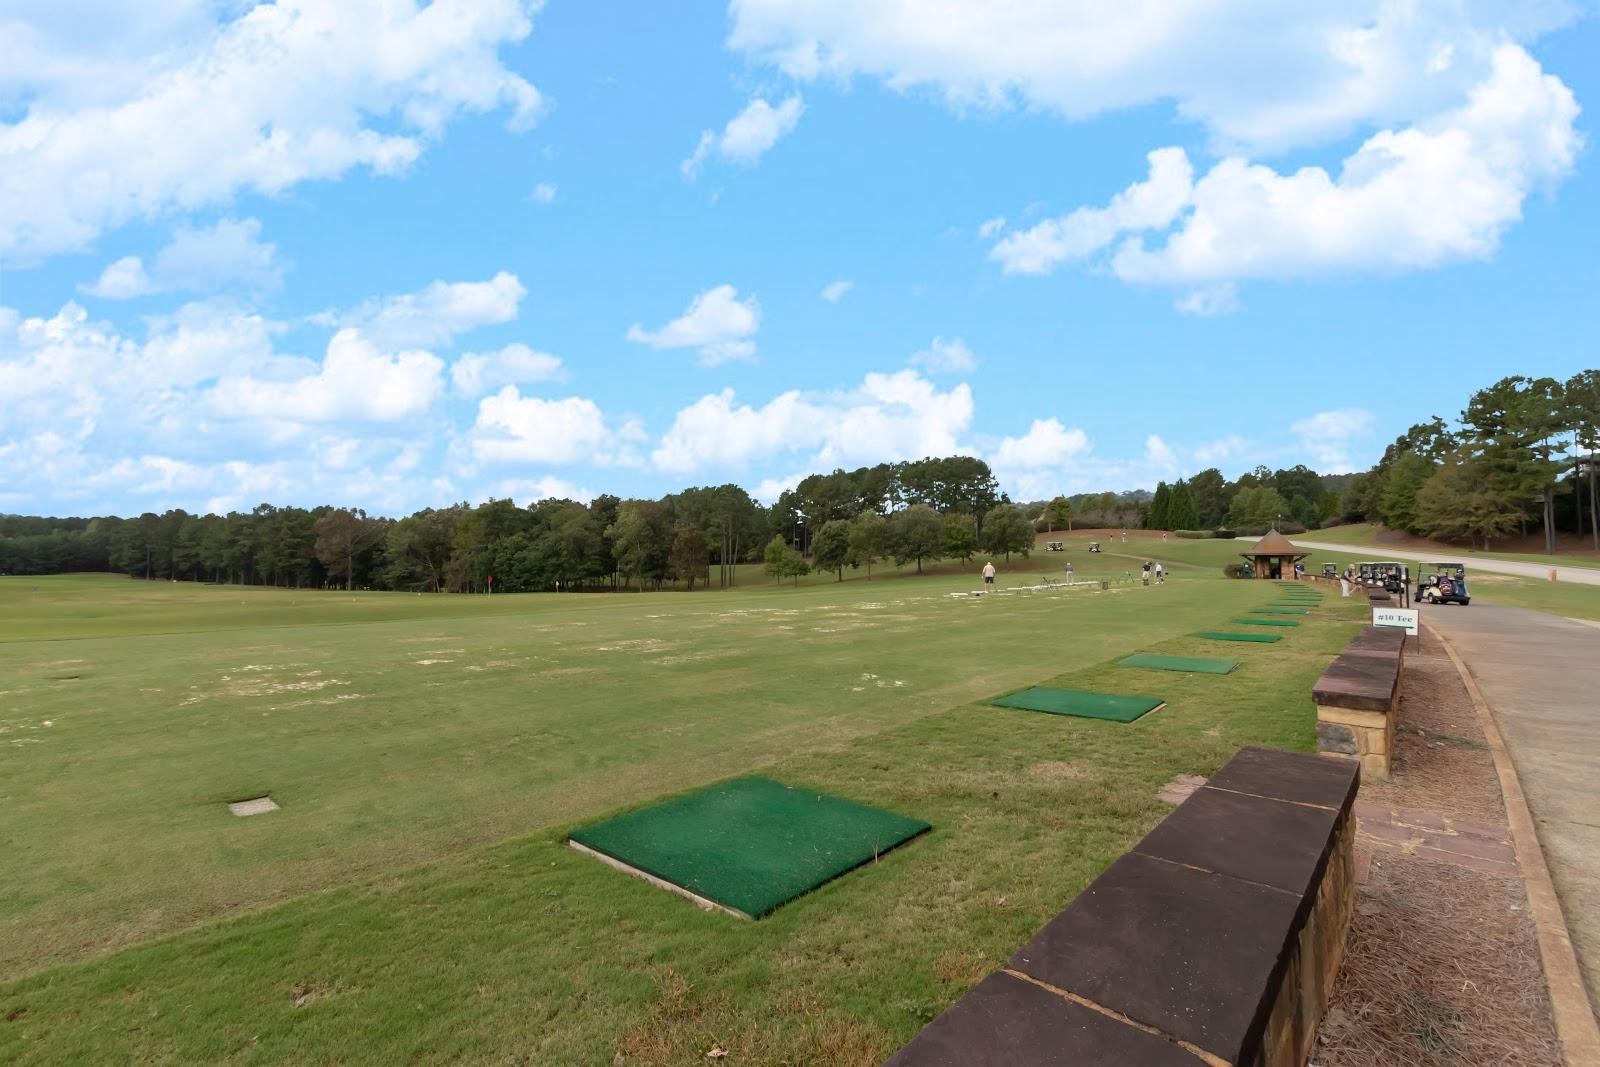 Ballantrae golf tee practice